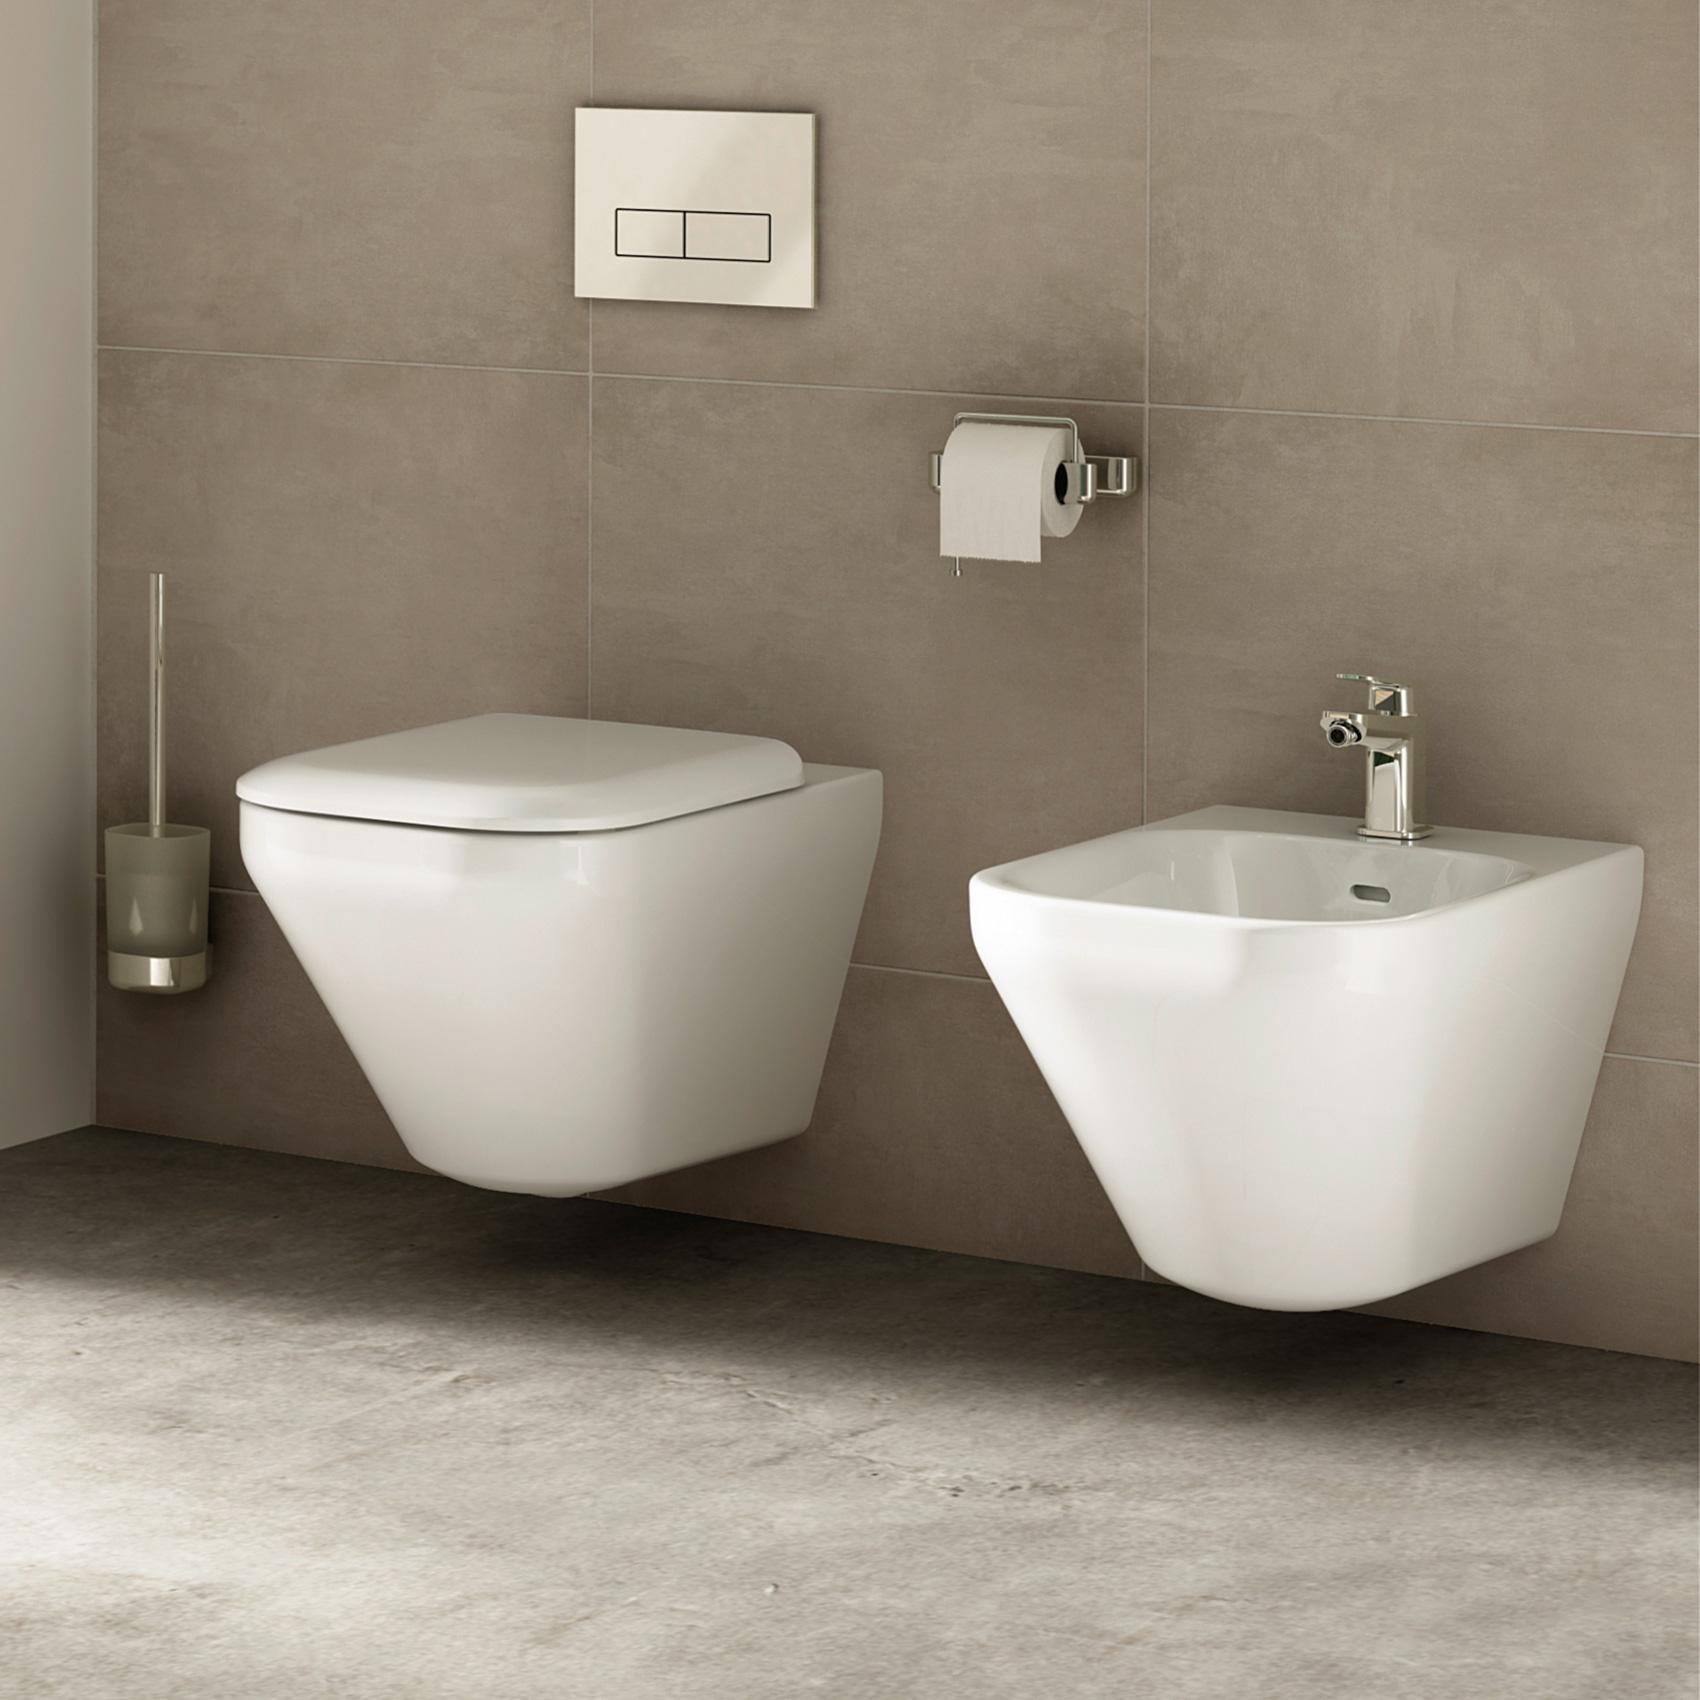 ideal standard tonic ii wandtiefsp lklosett aquablade l. Black Bedroom Furniture Sets. Home Design Ideas